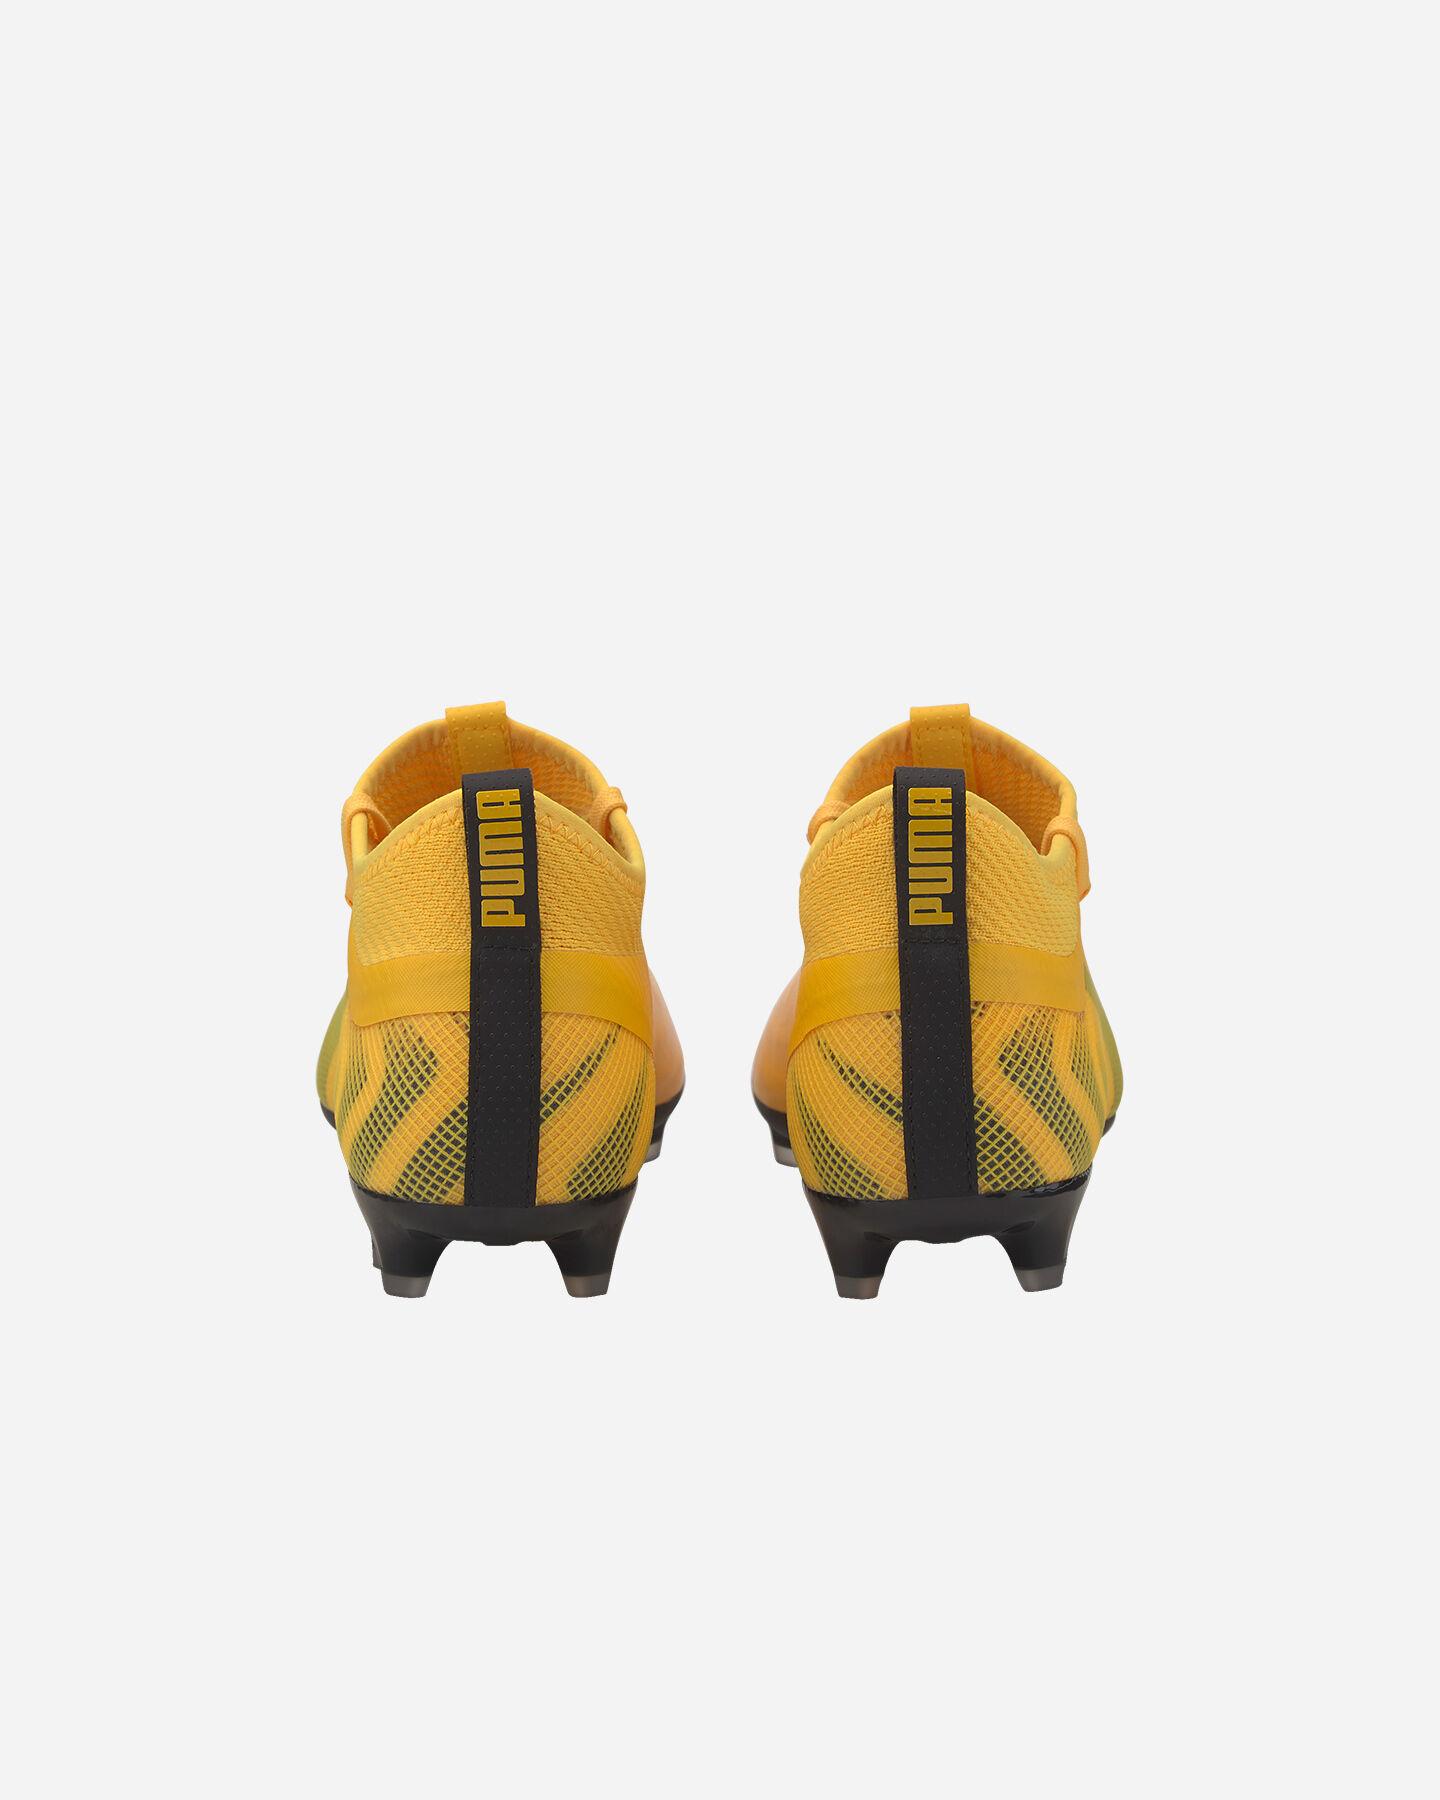 Scarpe calcio PUMA ONE 20.2 FG/AG M S5173187 scatto 4